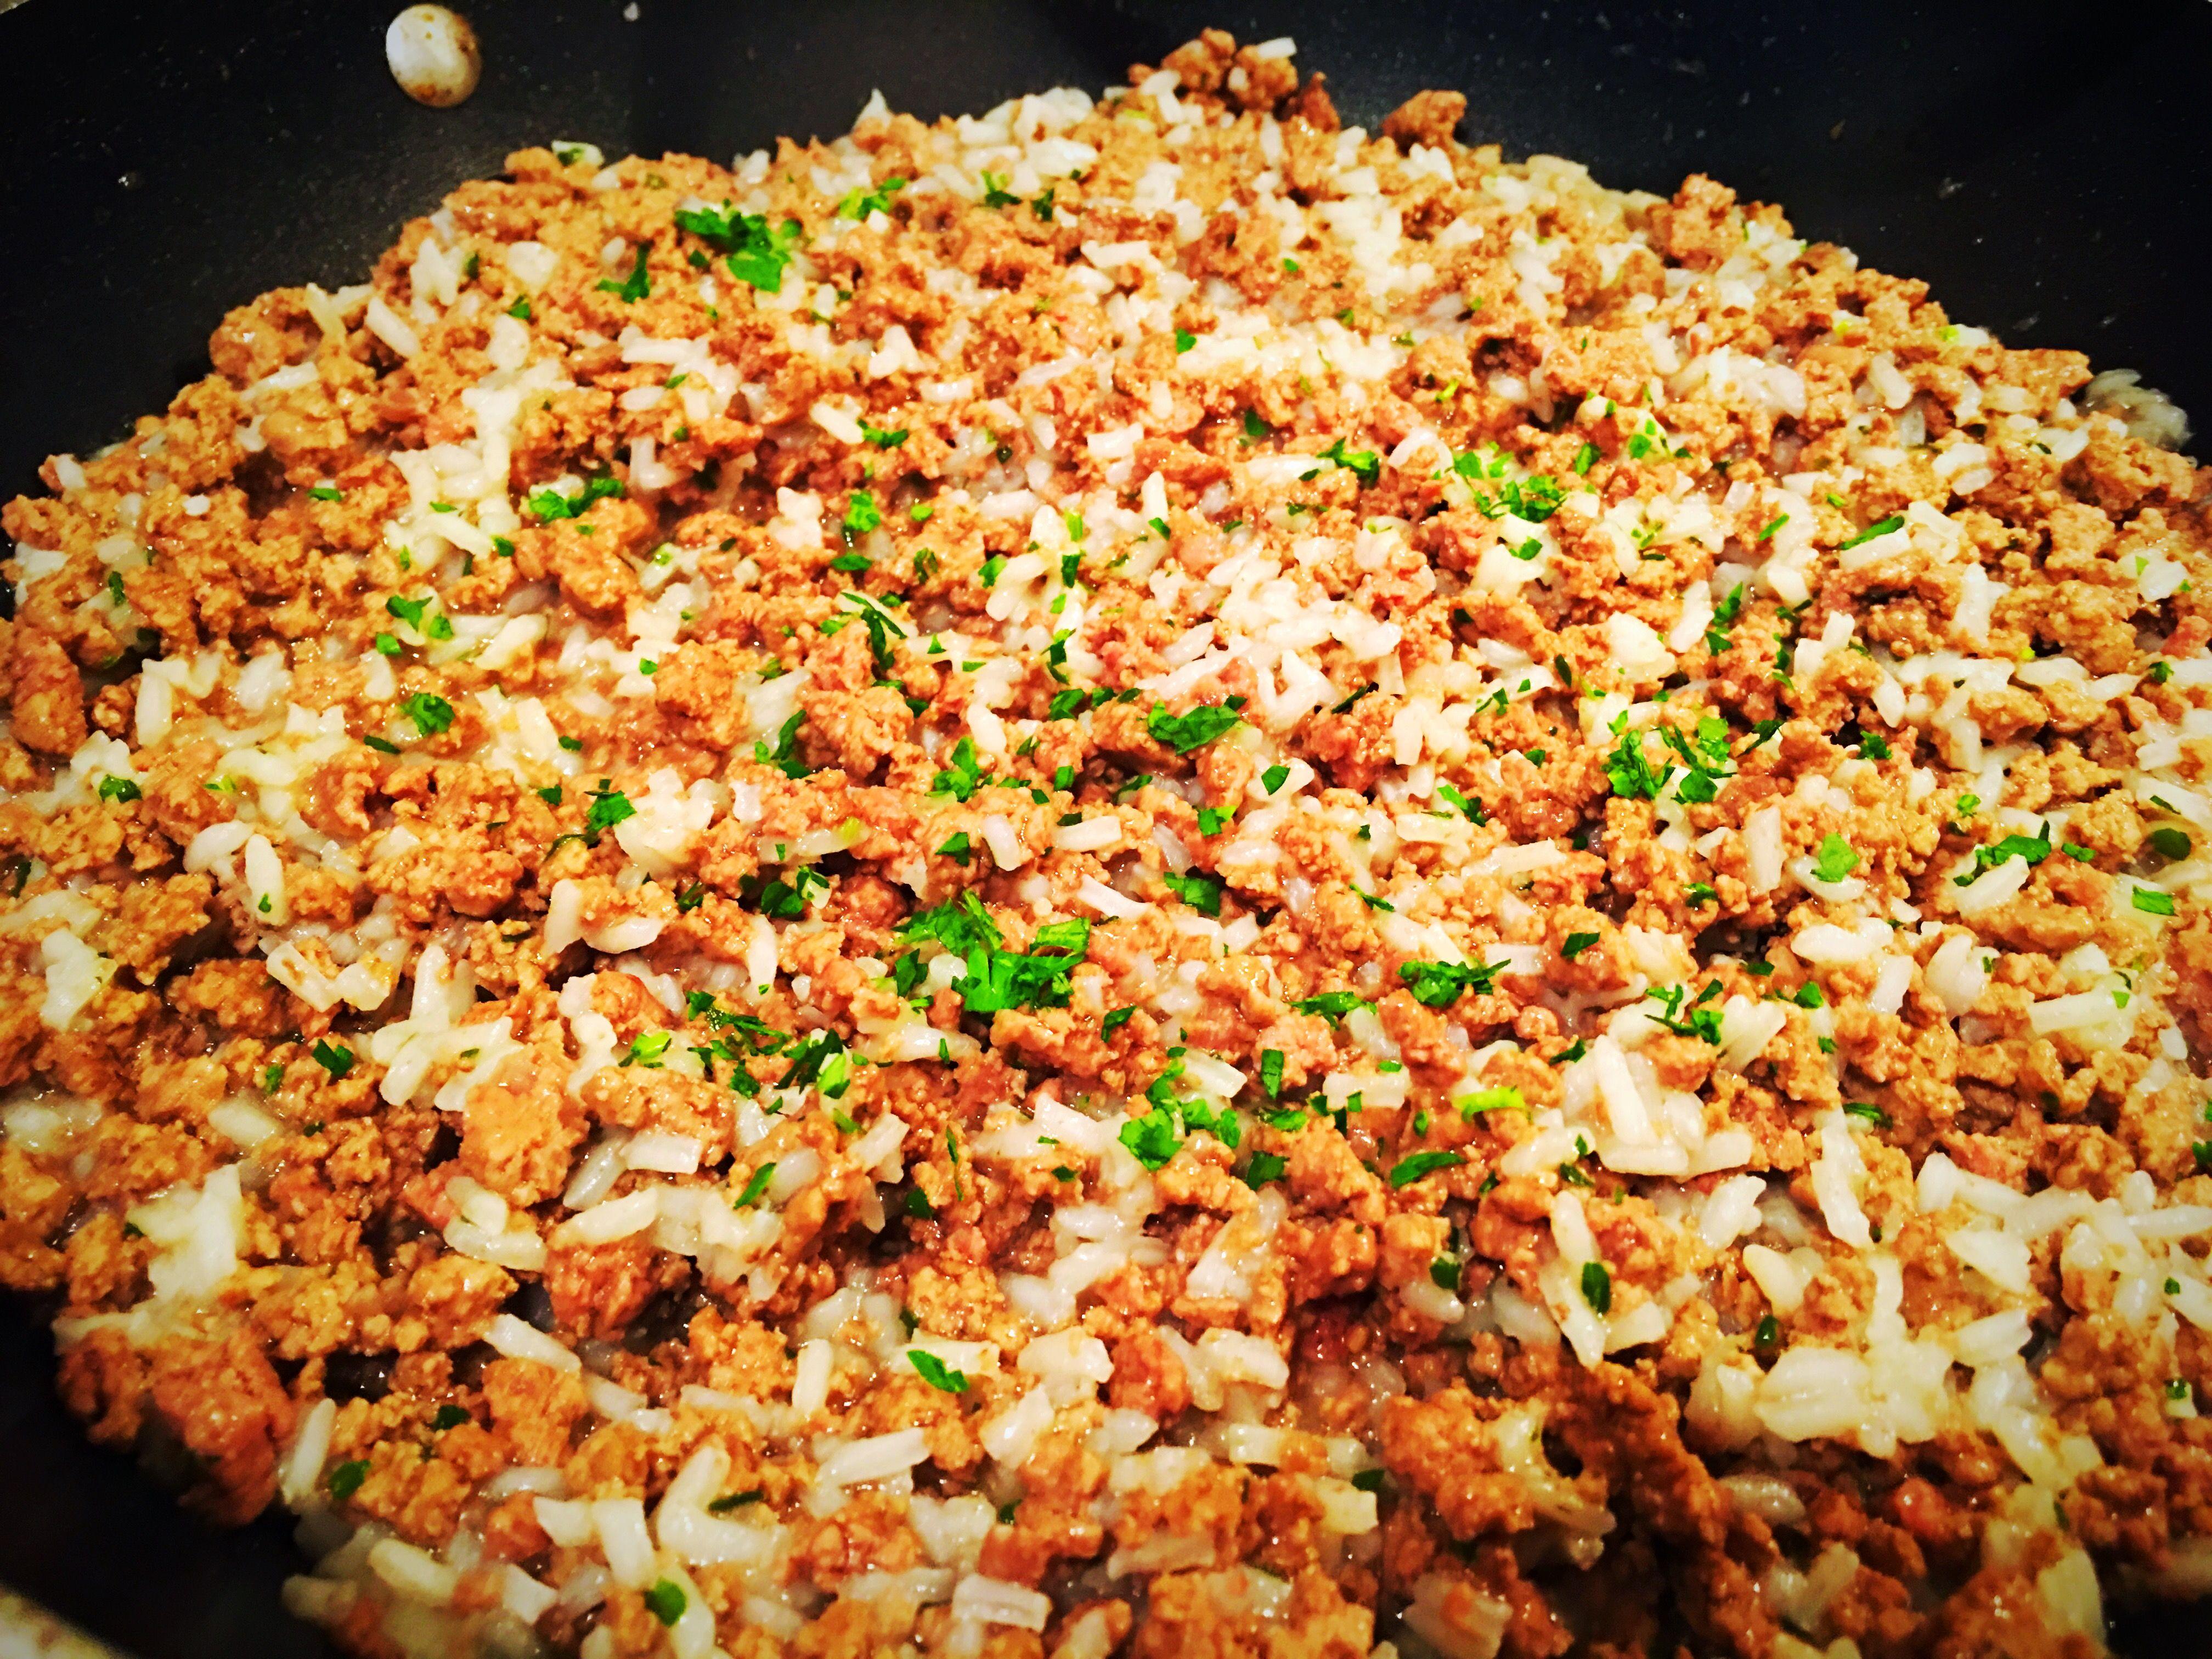 Puppy Chow Organic Beef Rice Homemade Dog Food Duke Of